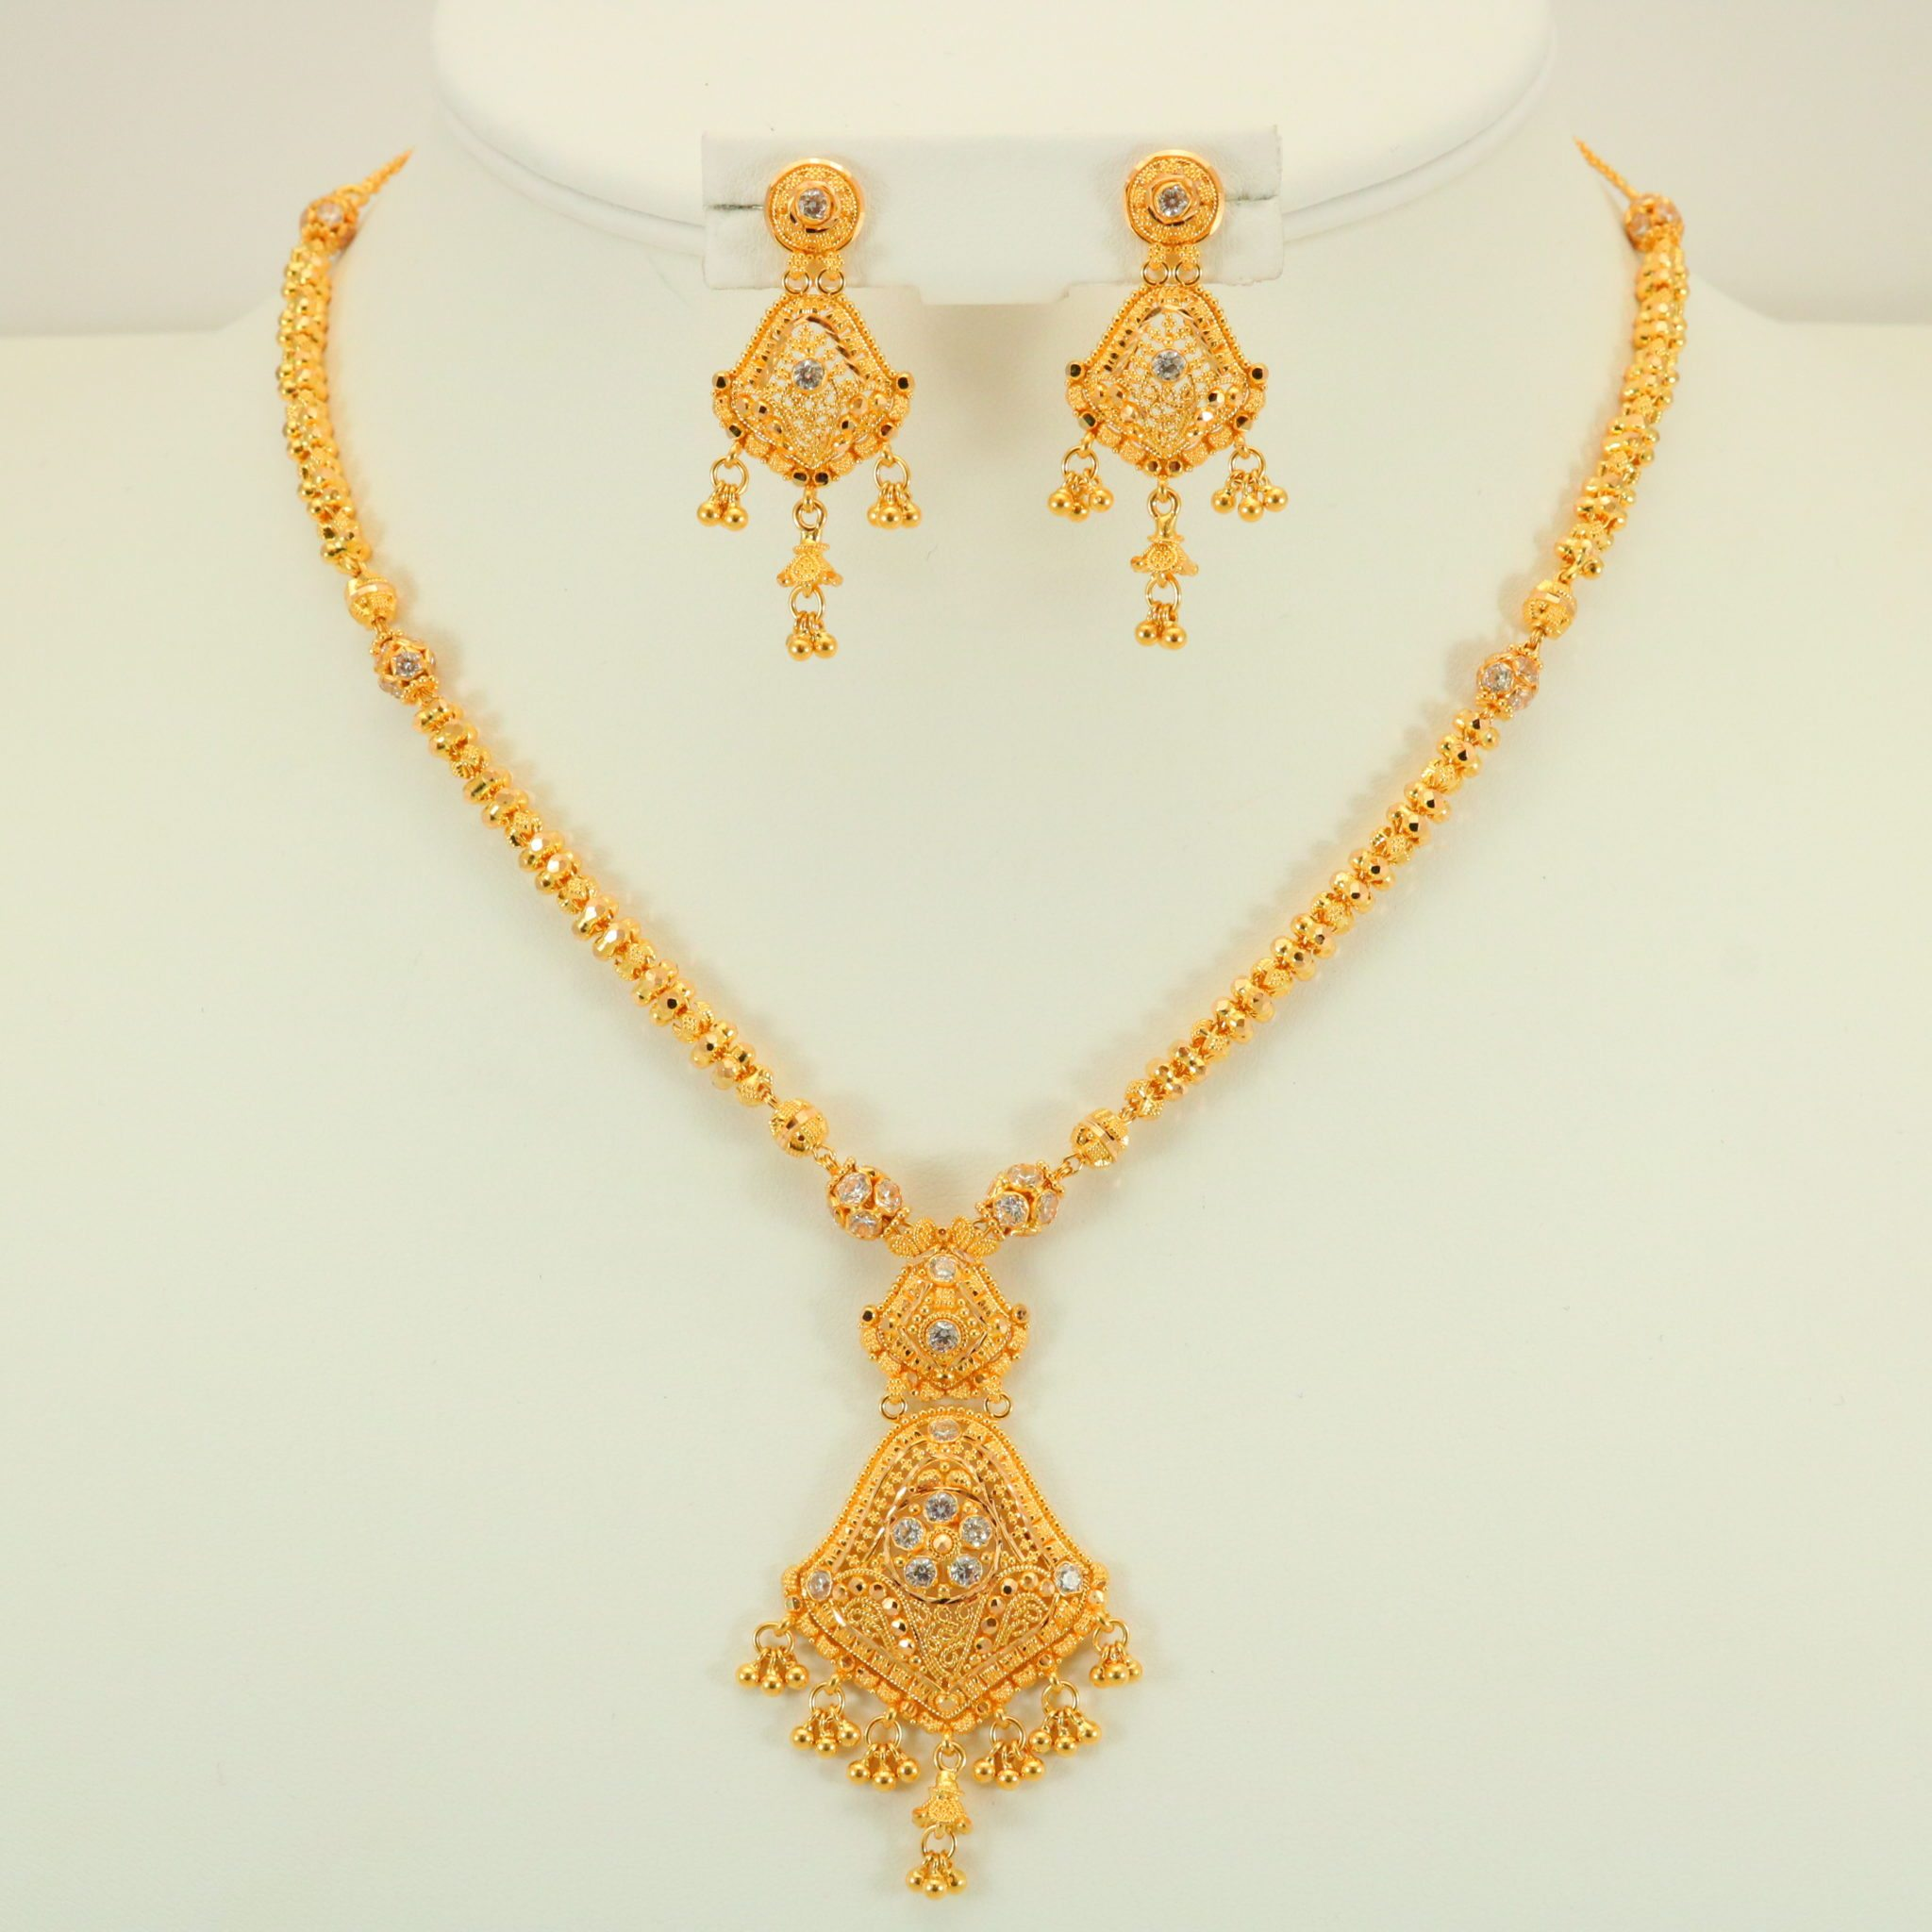 22 Carat Indian Gold Fancy Necklace Set 32.8 Grams | Gold ...